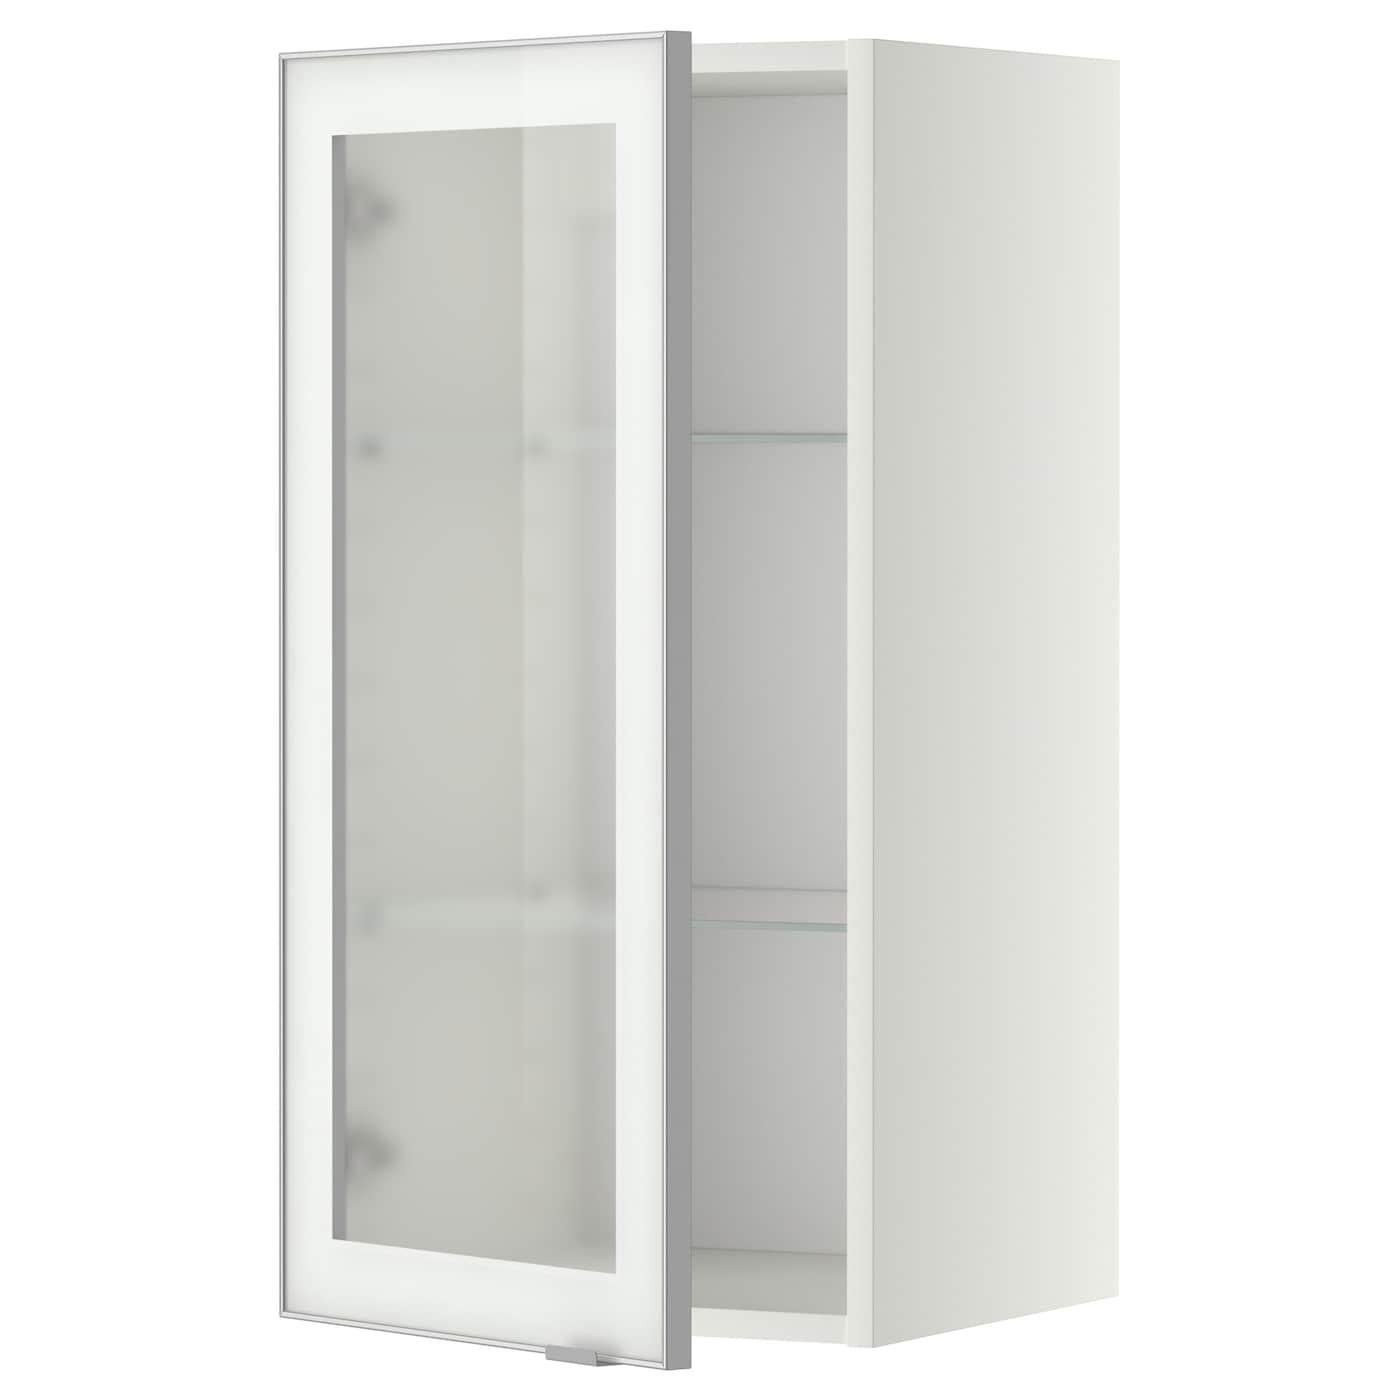 Metod Wall Cabinet W Shelves Glass Door White Jutis